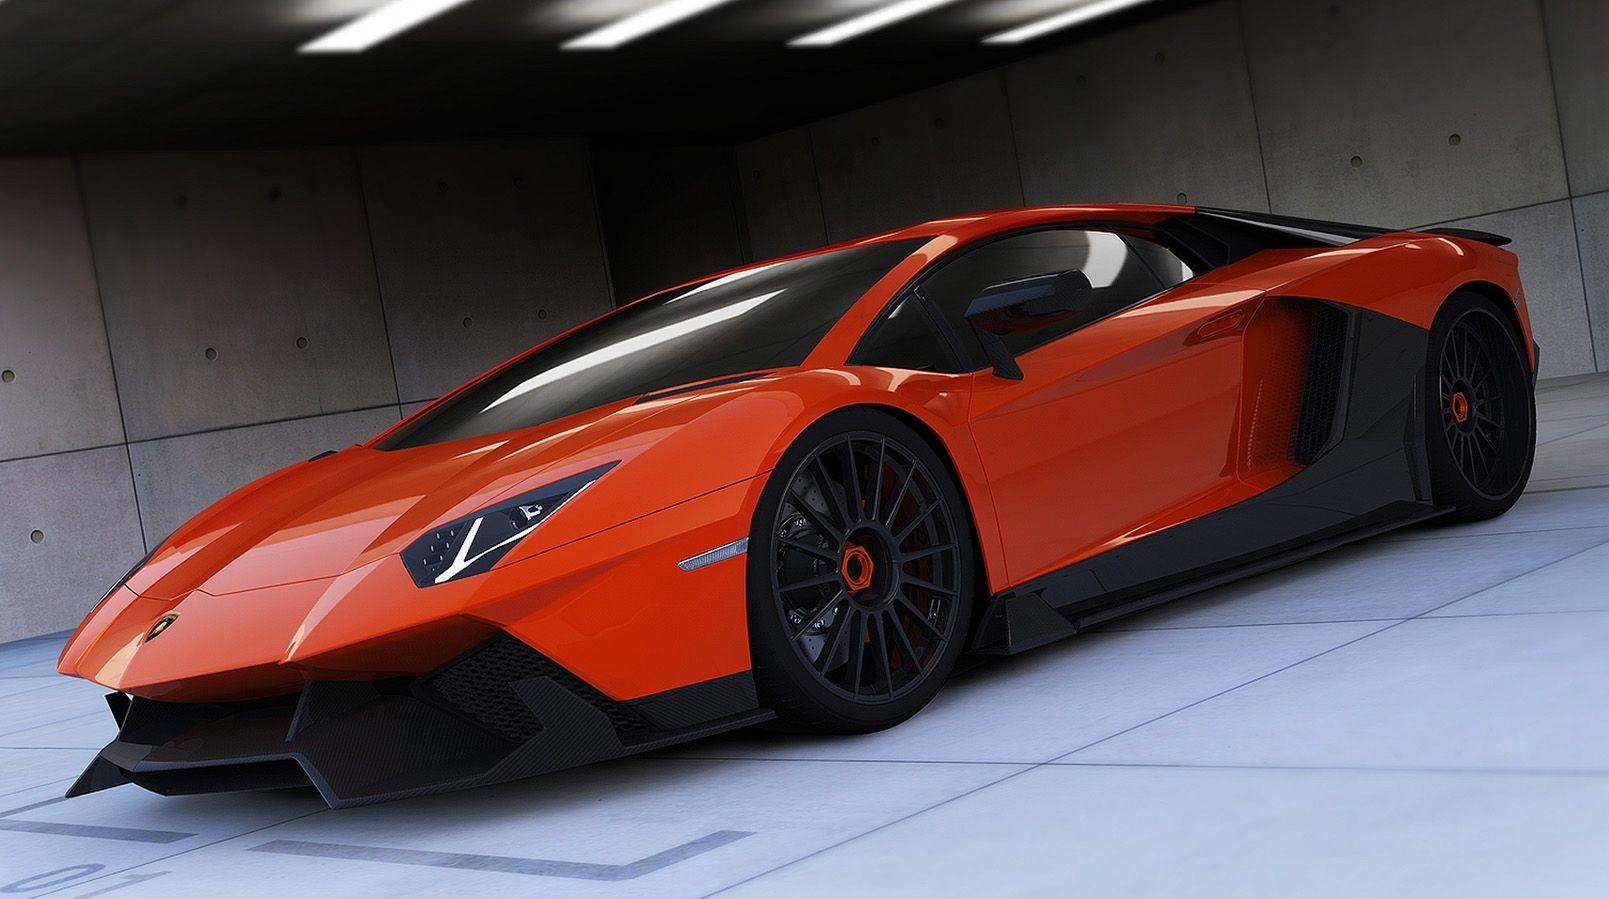 Lamborghini Aventador Dragon Edition Red | Lamborghini Car ...